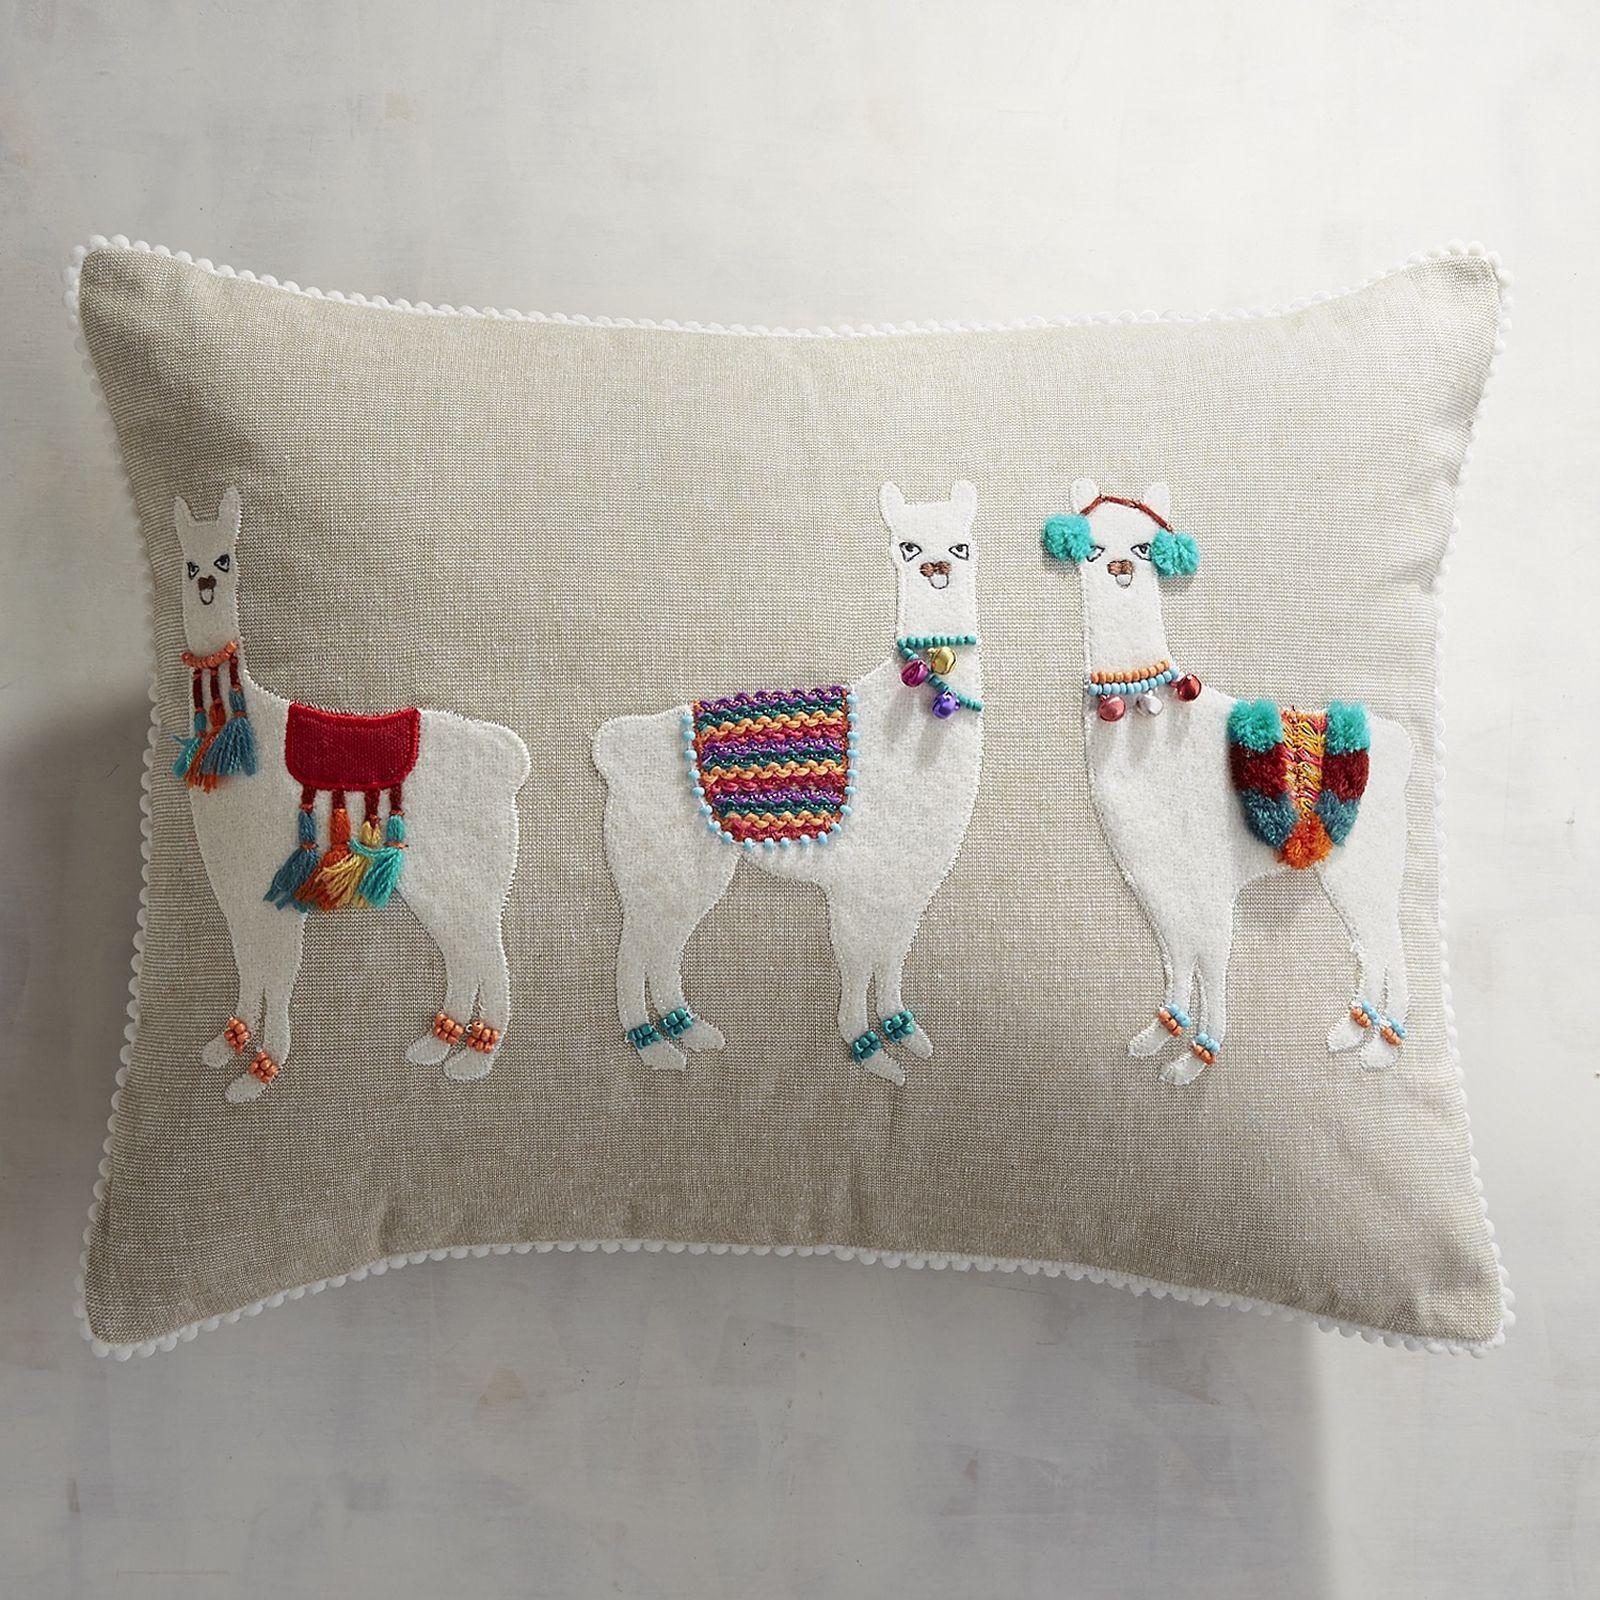 Llama pillow from Pier One ~   Want Home   Pinterest   Pillows ...